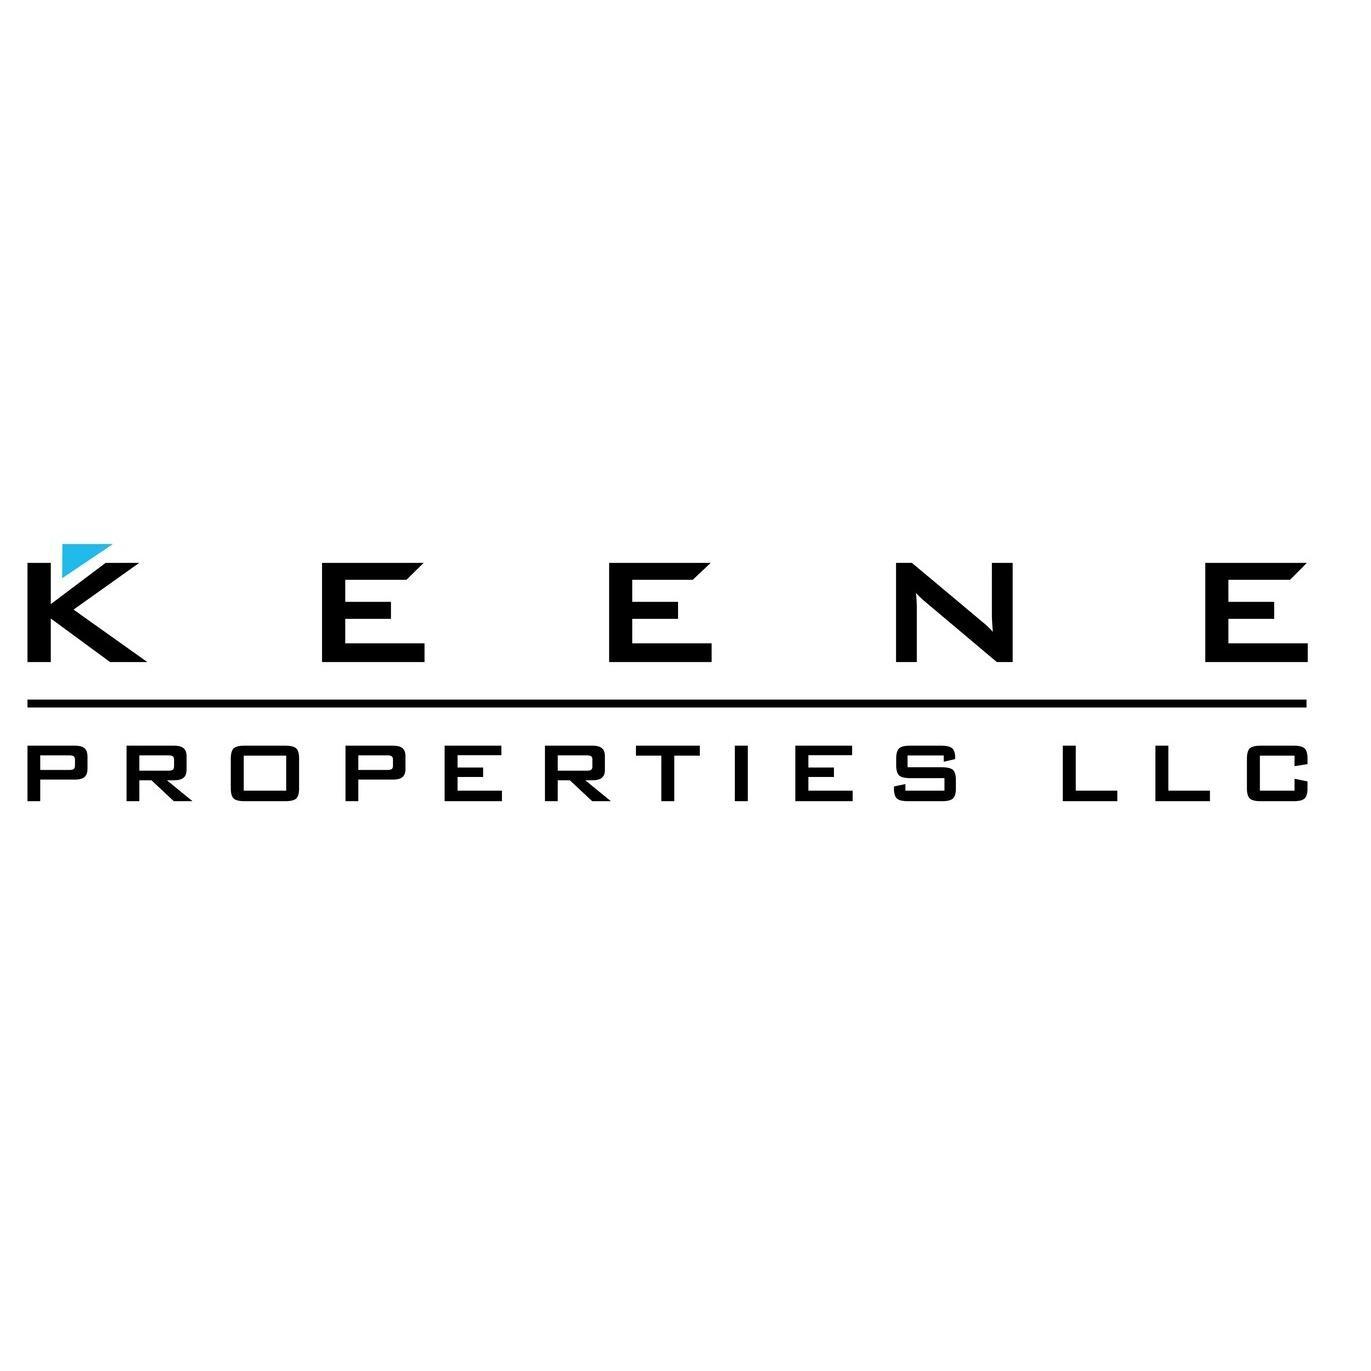 Harvey Keene - Keene Properties, LLC image 1